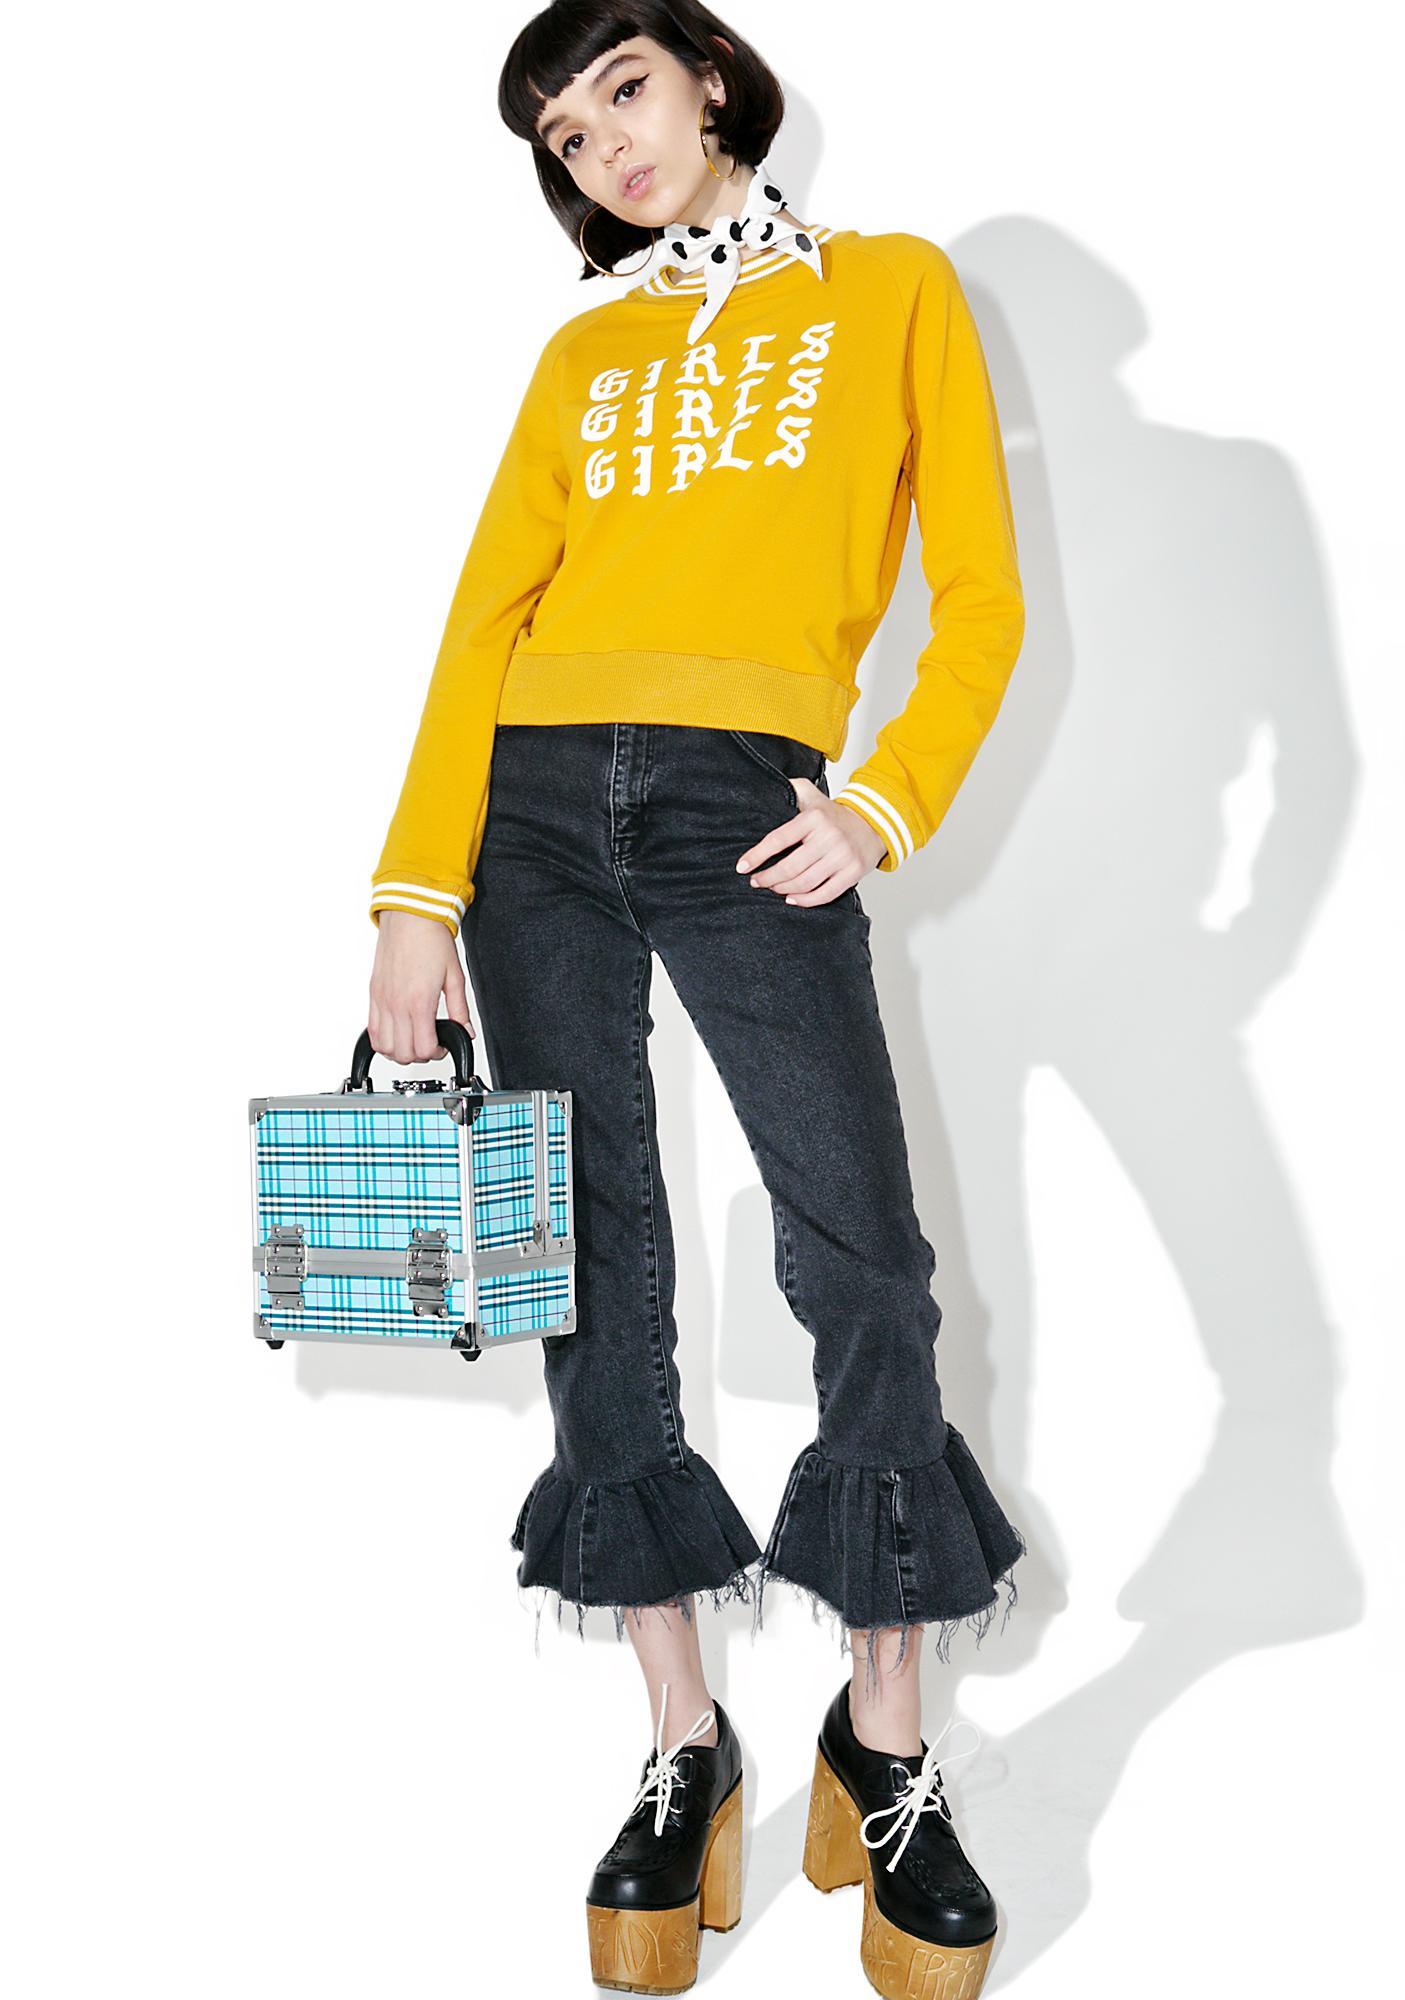 Valfré Girls Girls Girls Sweatshirt